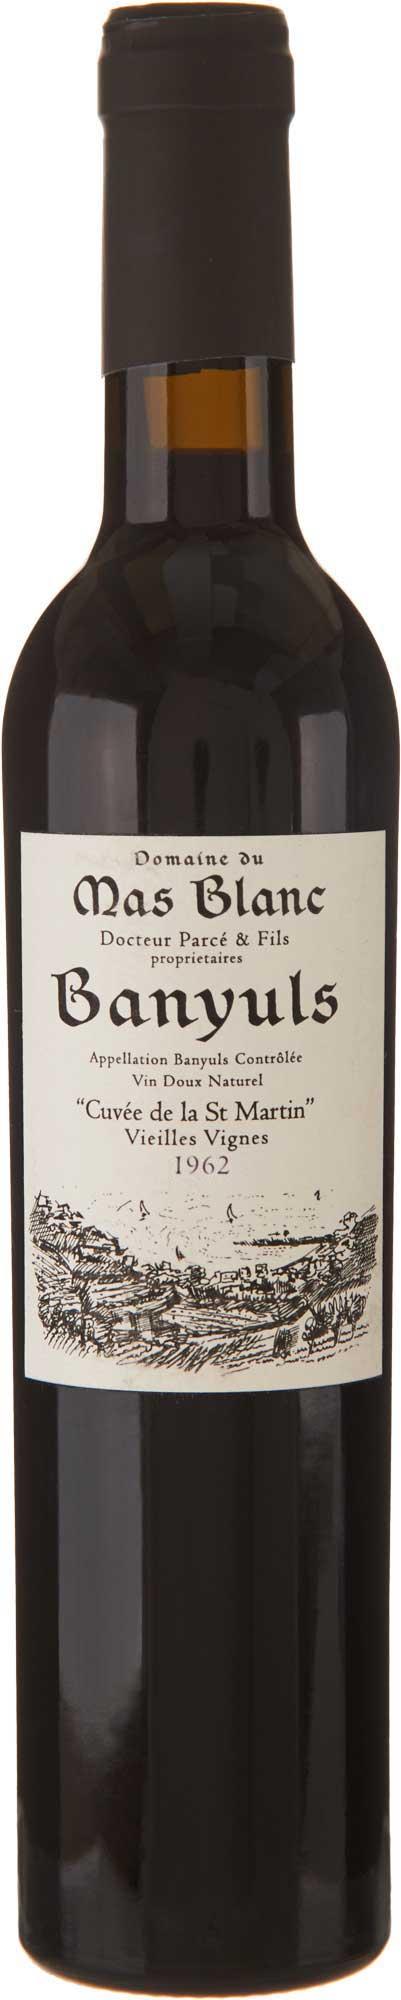 Domaine du Mas Blanc Banyuls 'Cuvée St. Martin' 1962